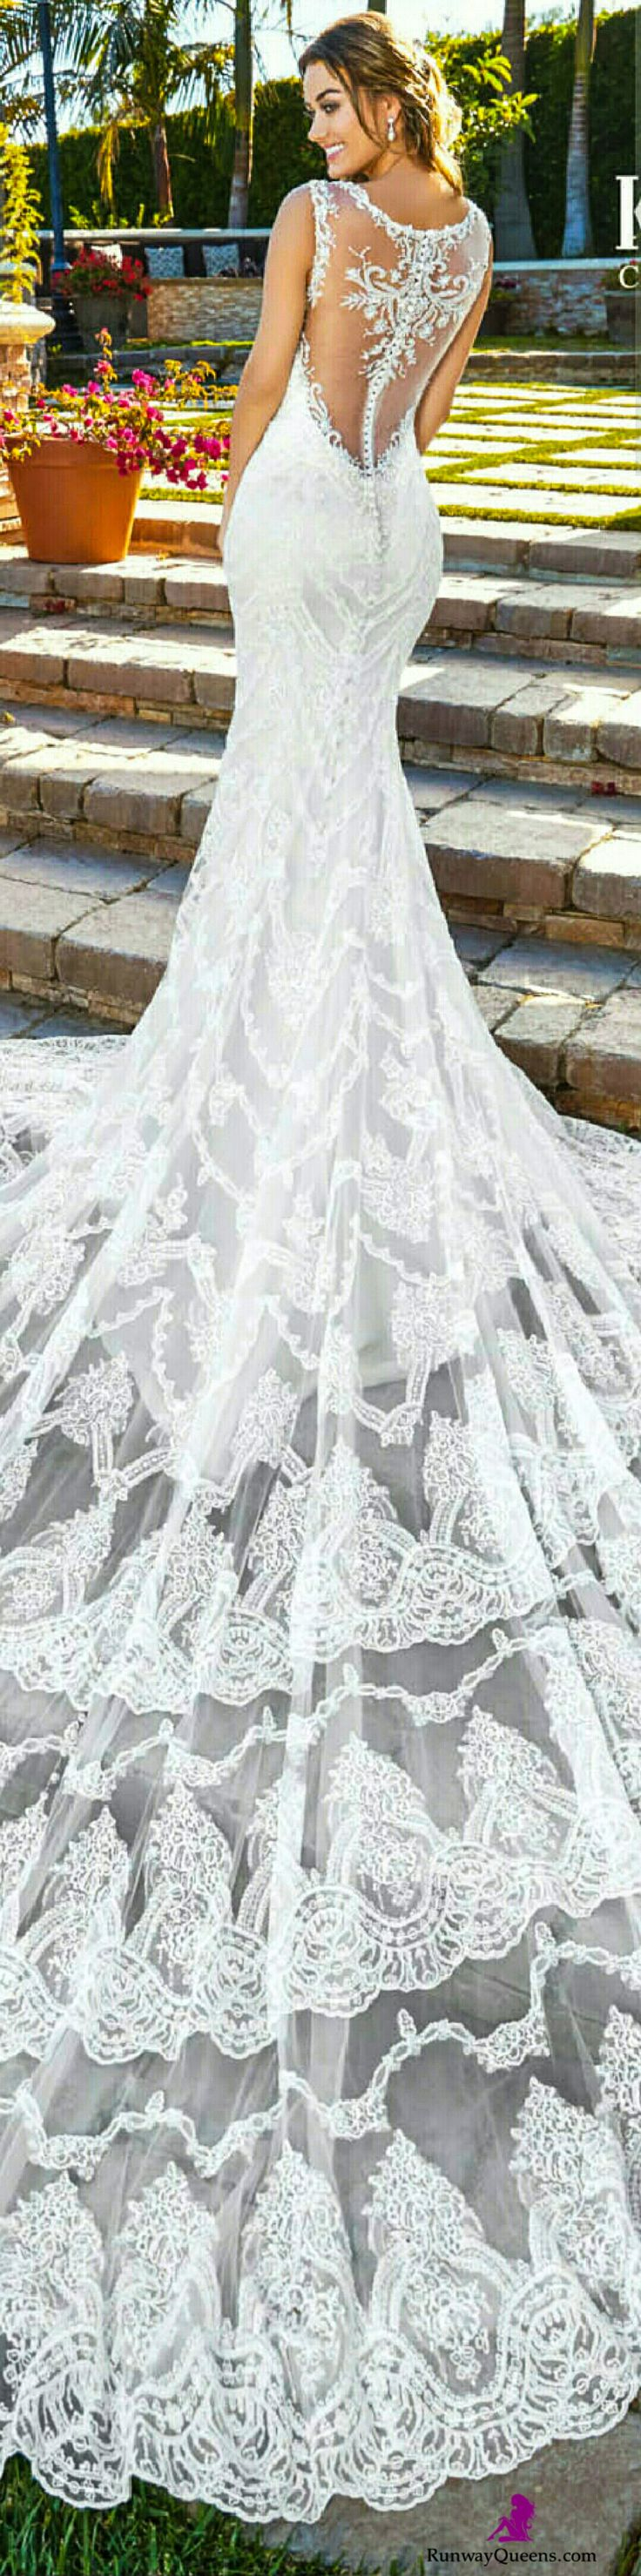 Kitty Chen Couture, Bridal 2017, train, white